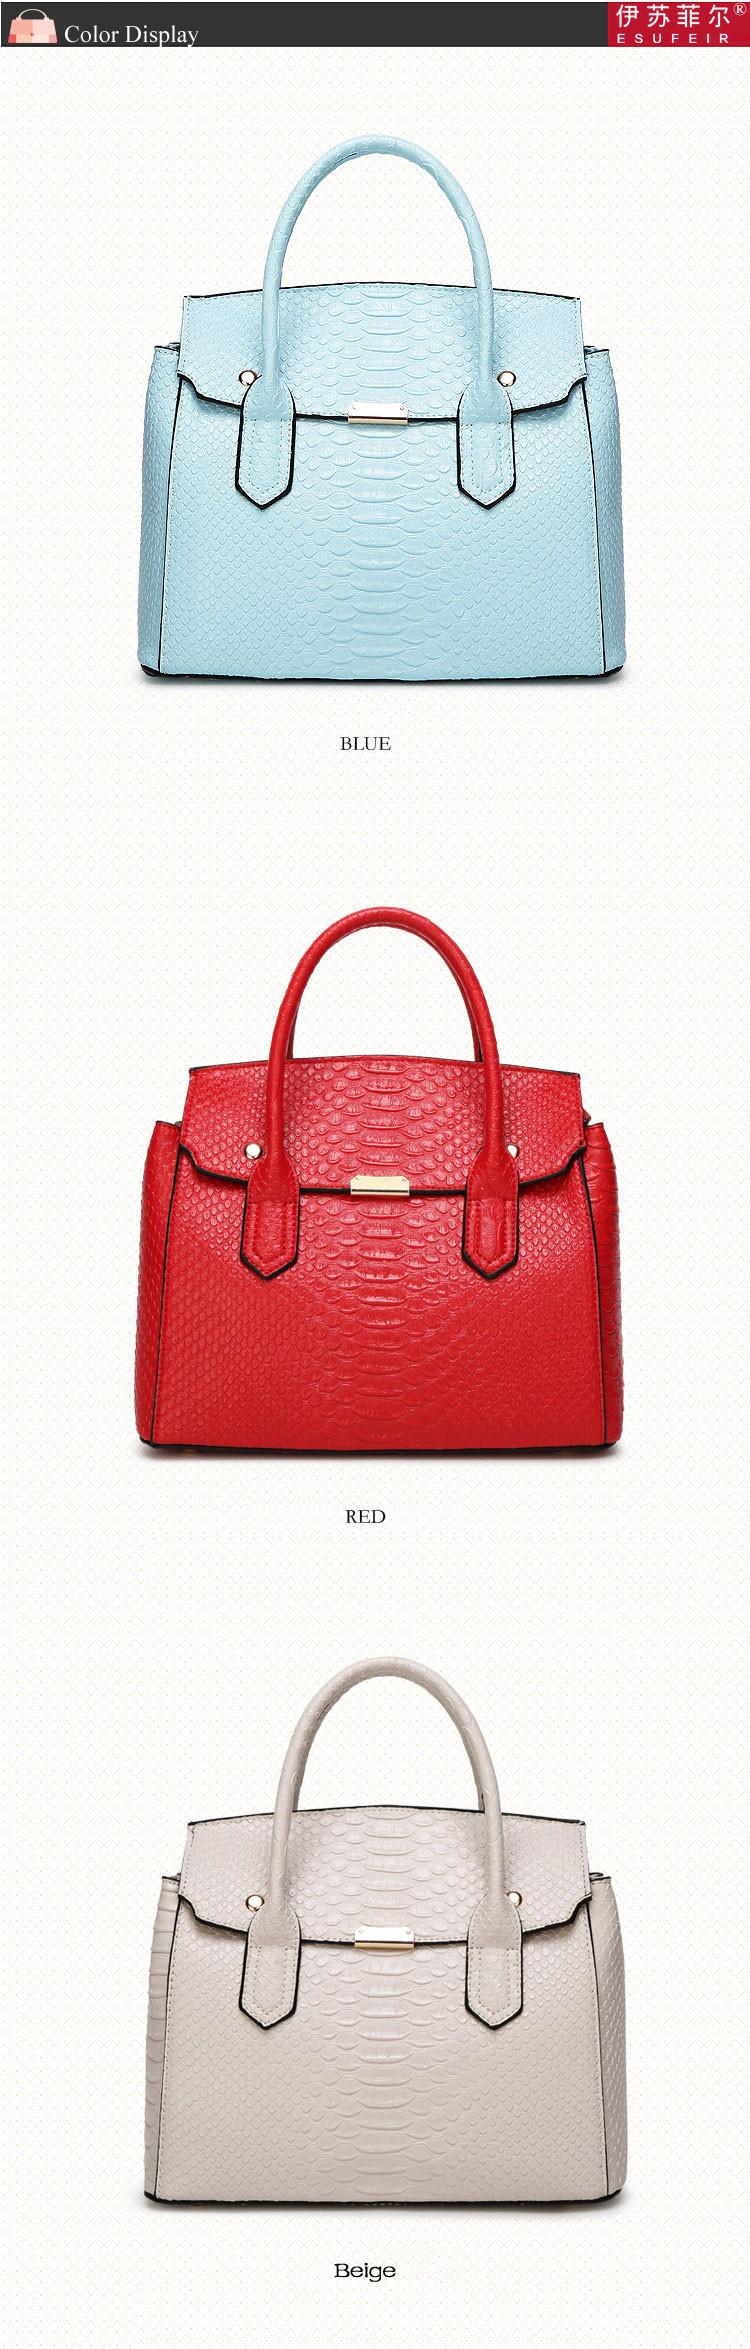 women-handbag03_01